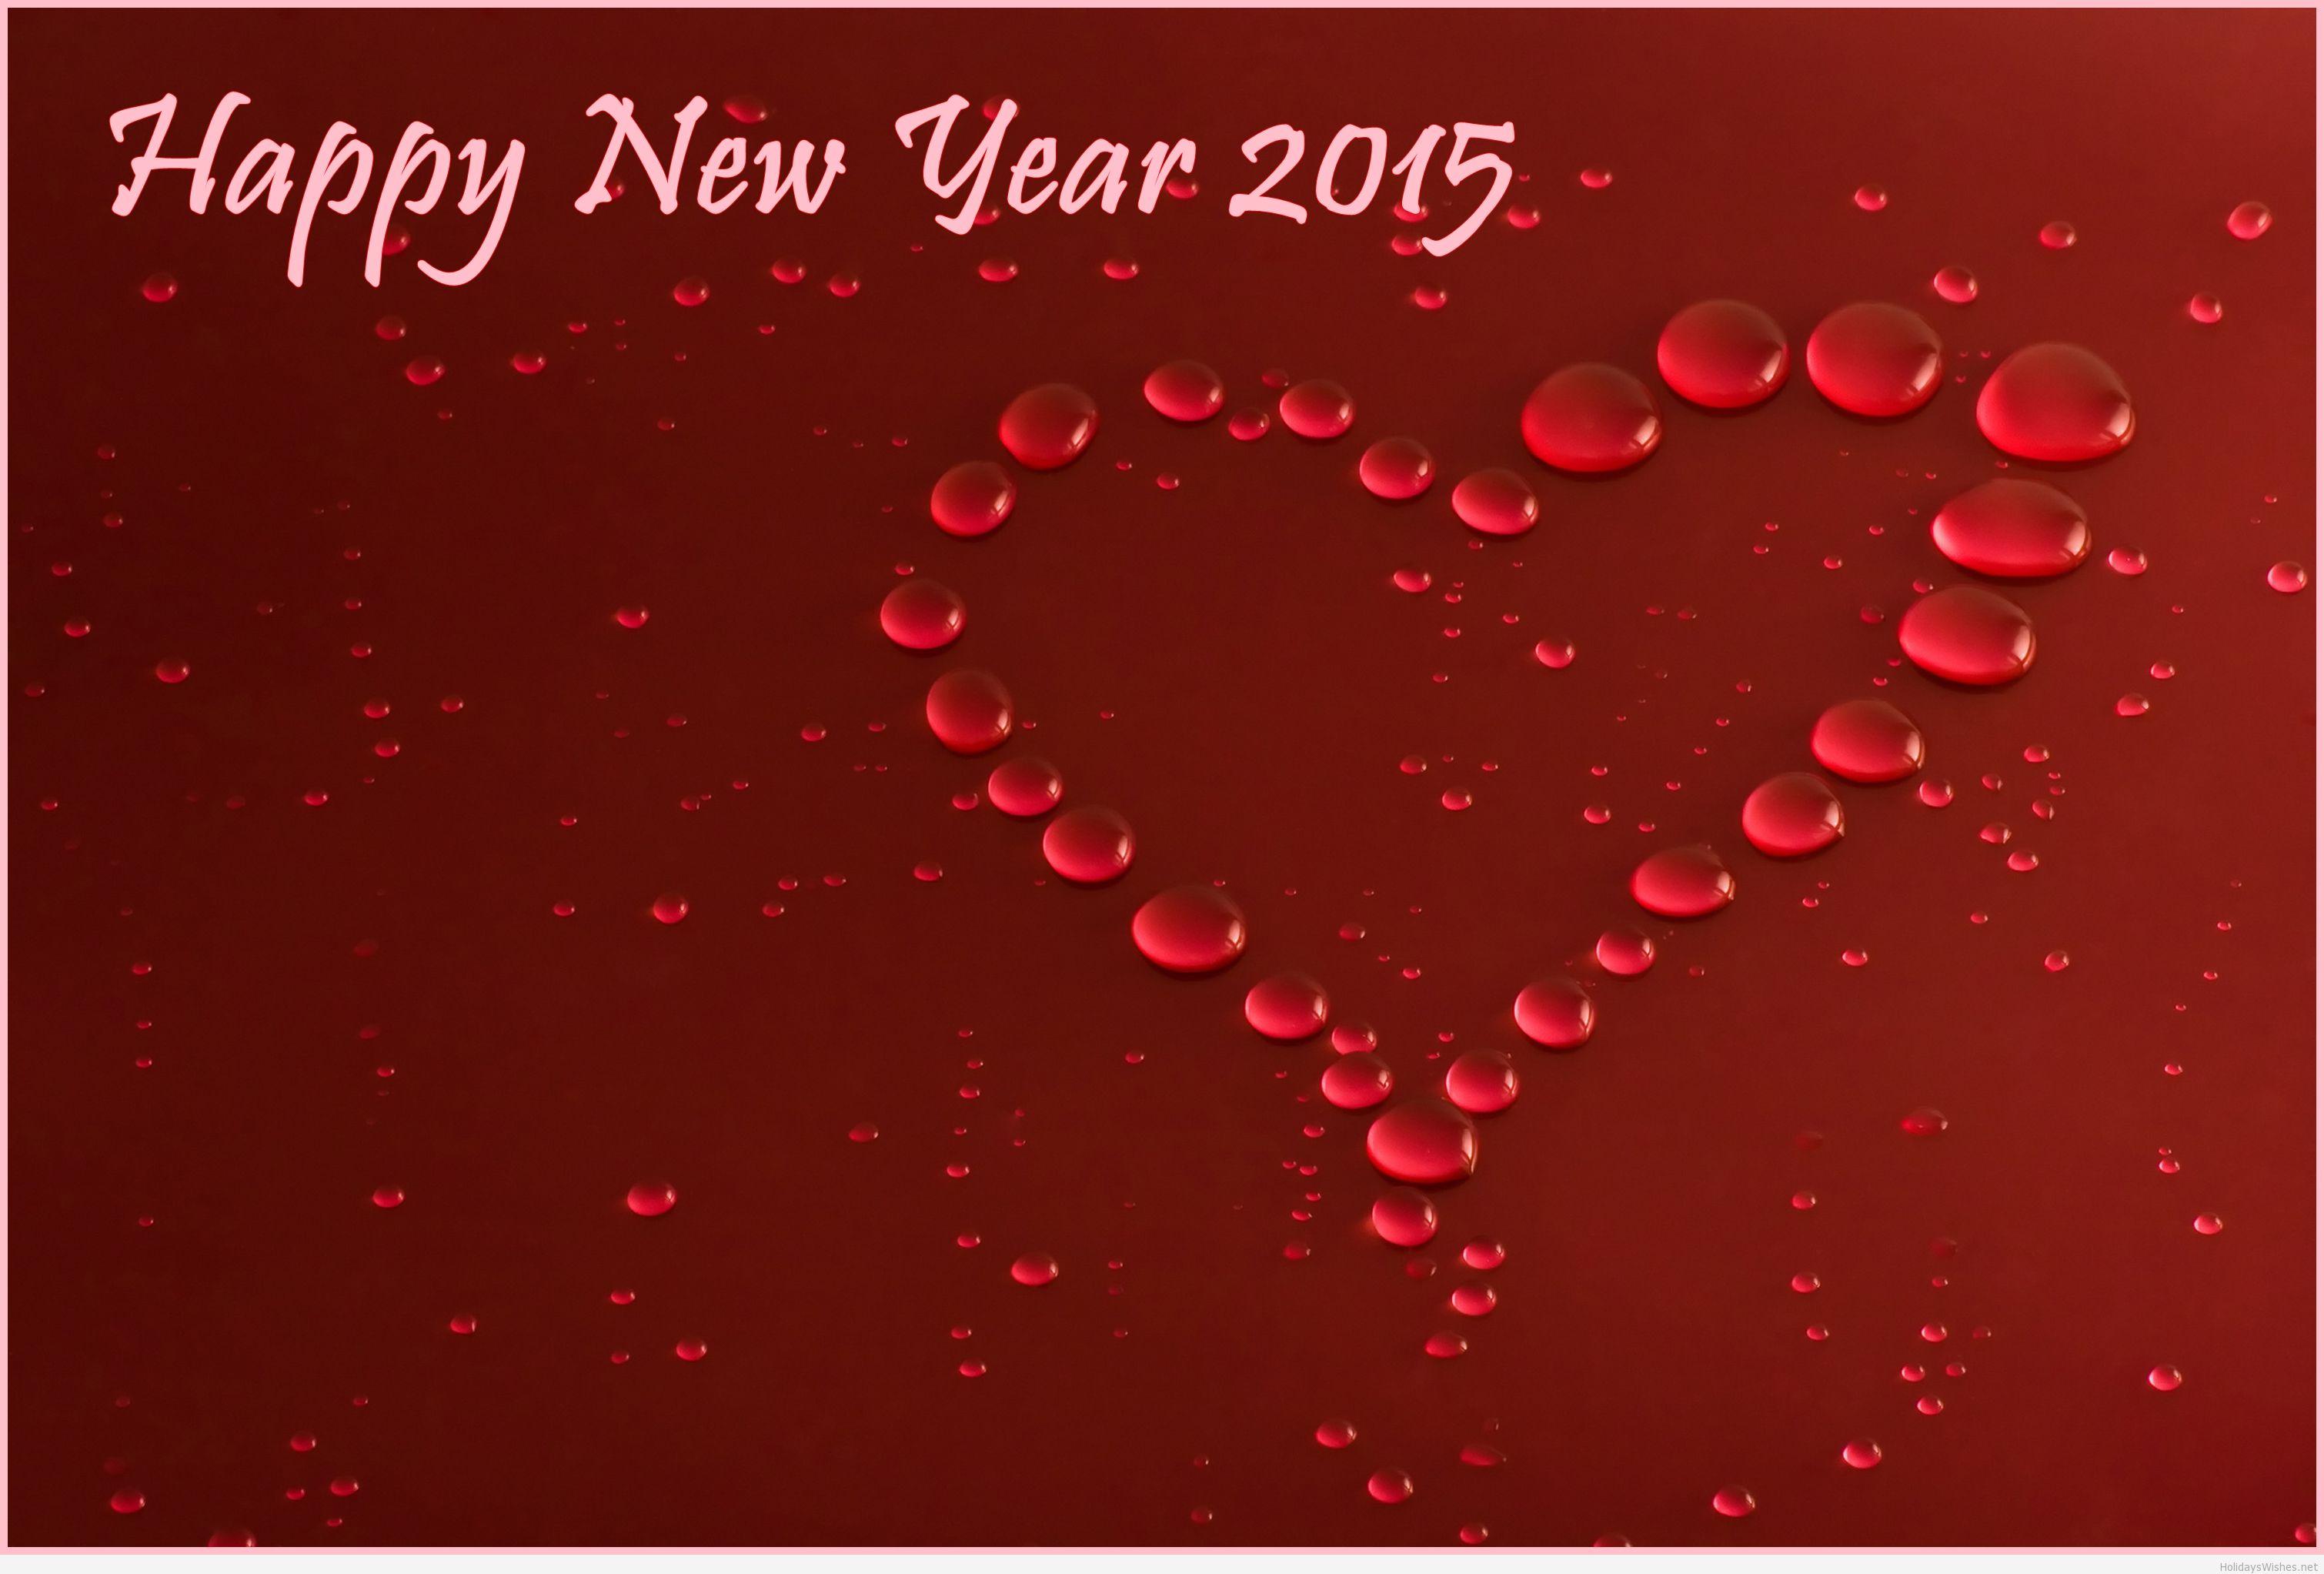 48+] Happy New Year Love Wallpaper 2015 on WallpaperSafari